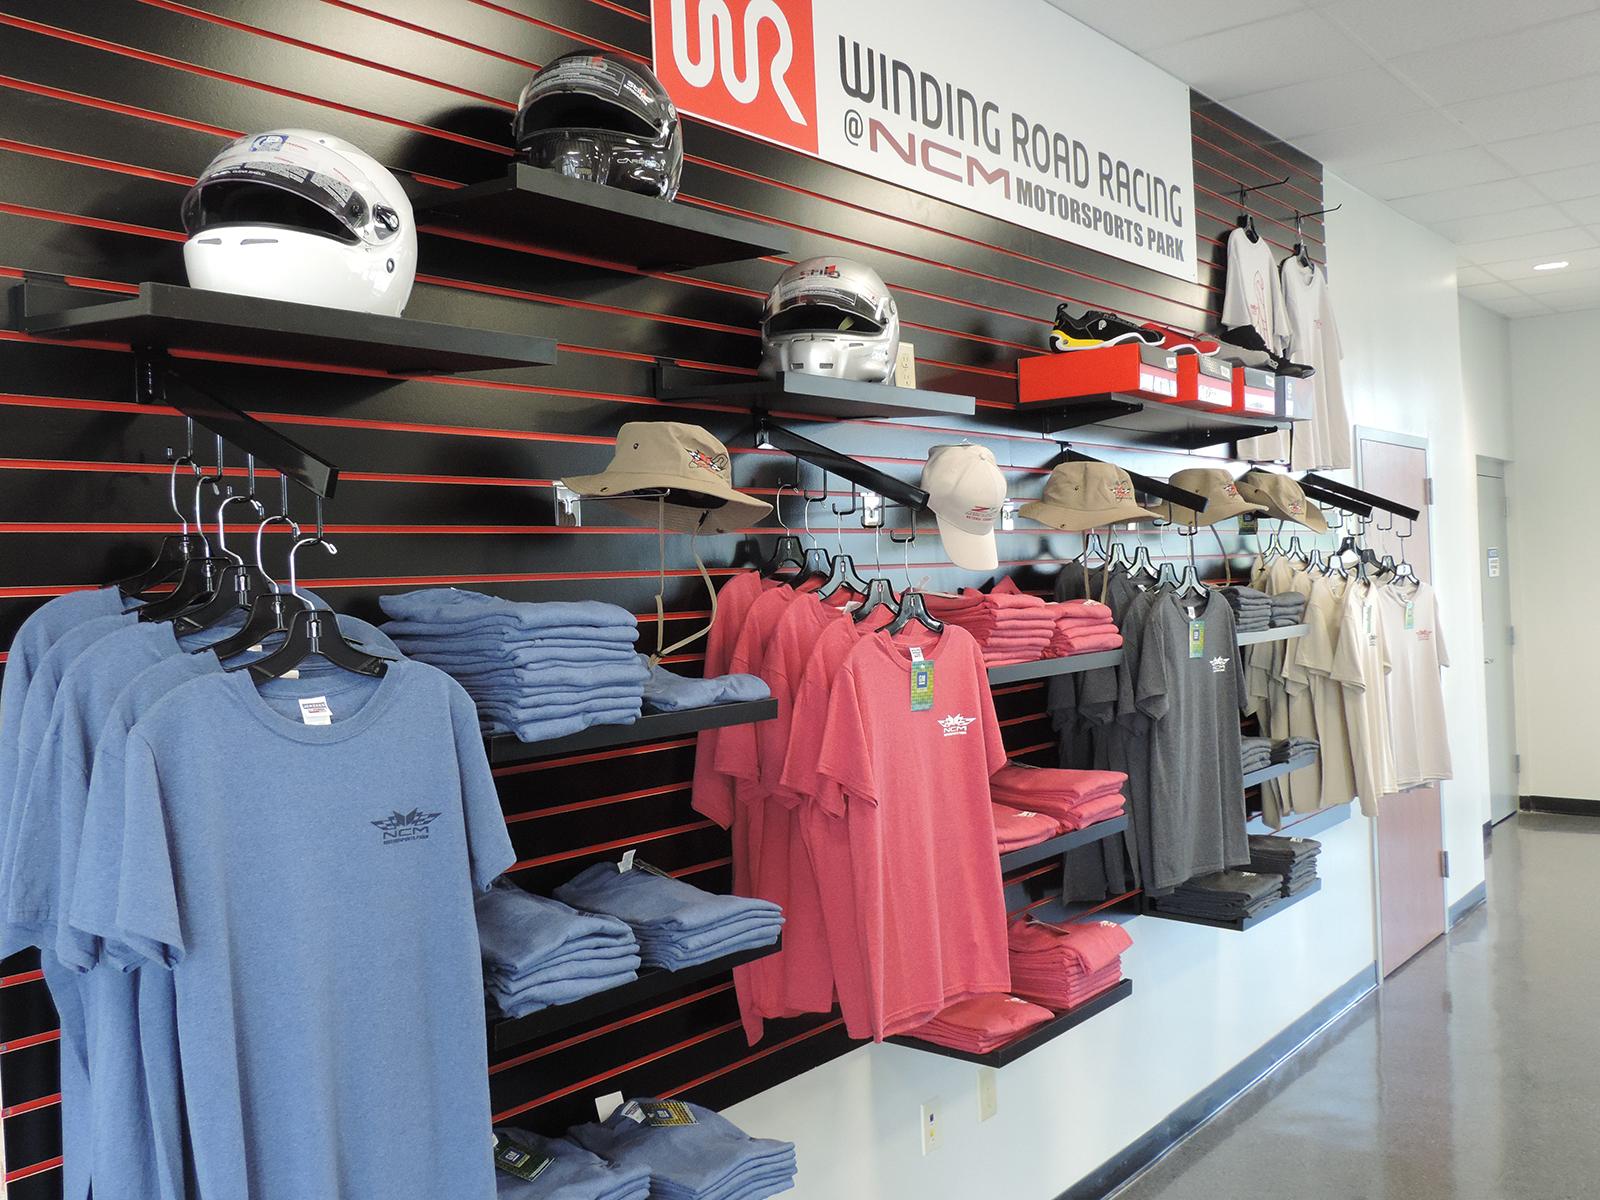 Winding Road Racing Store at NCM Motorsports Park